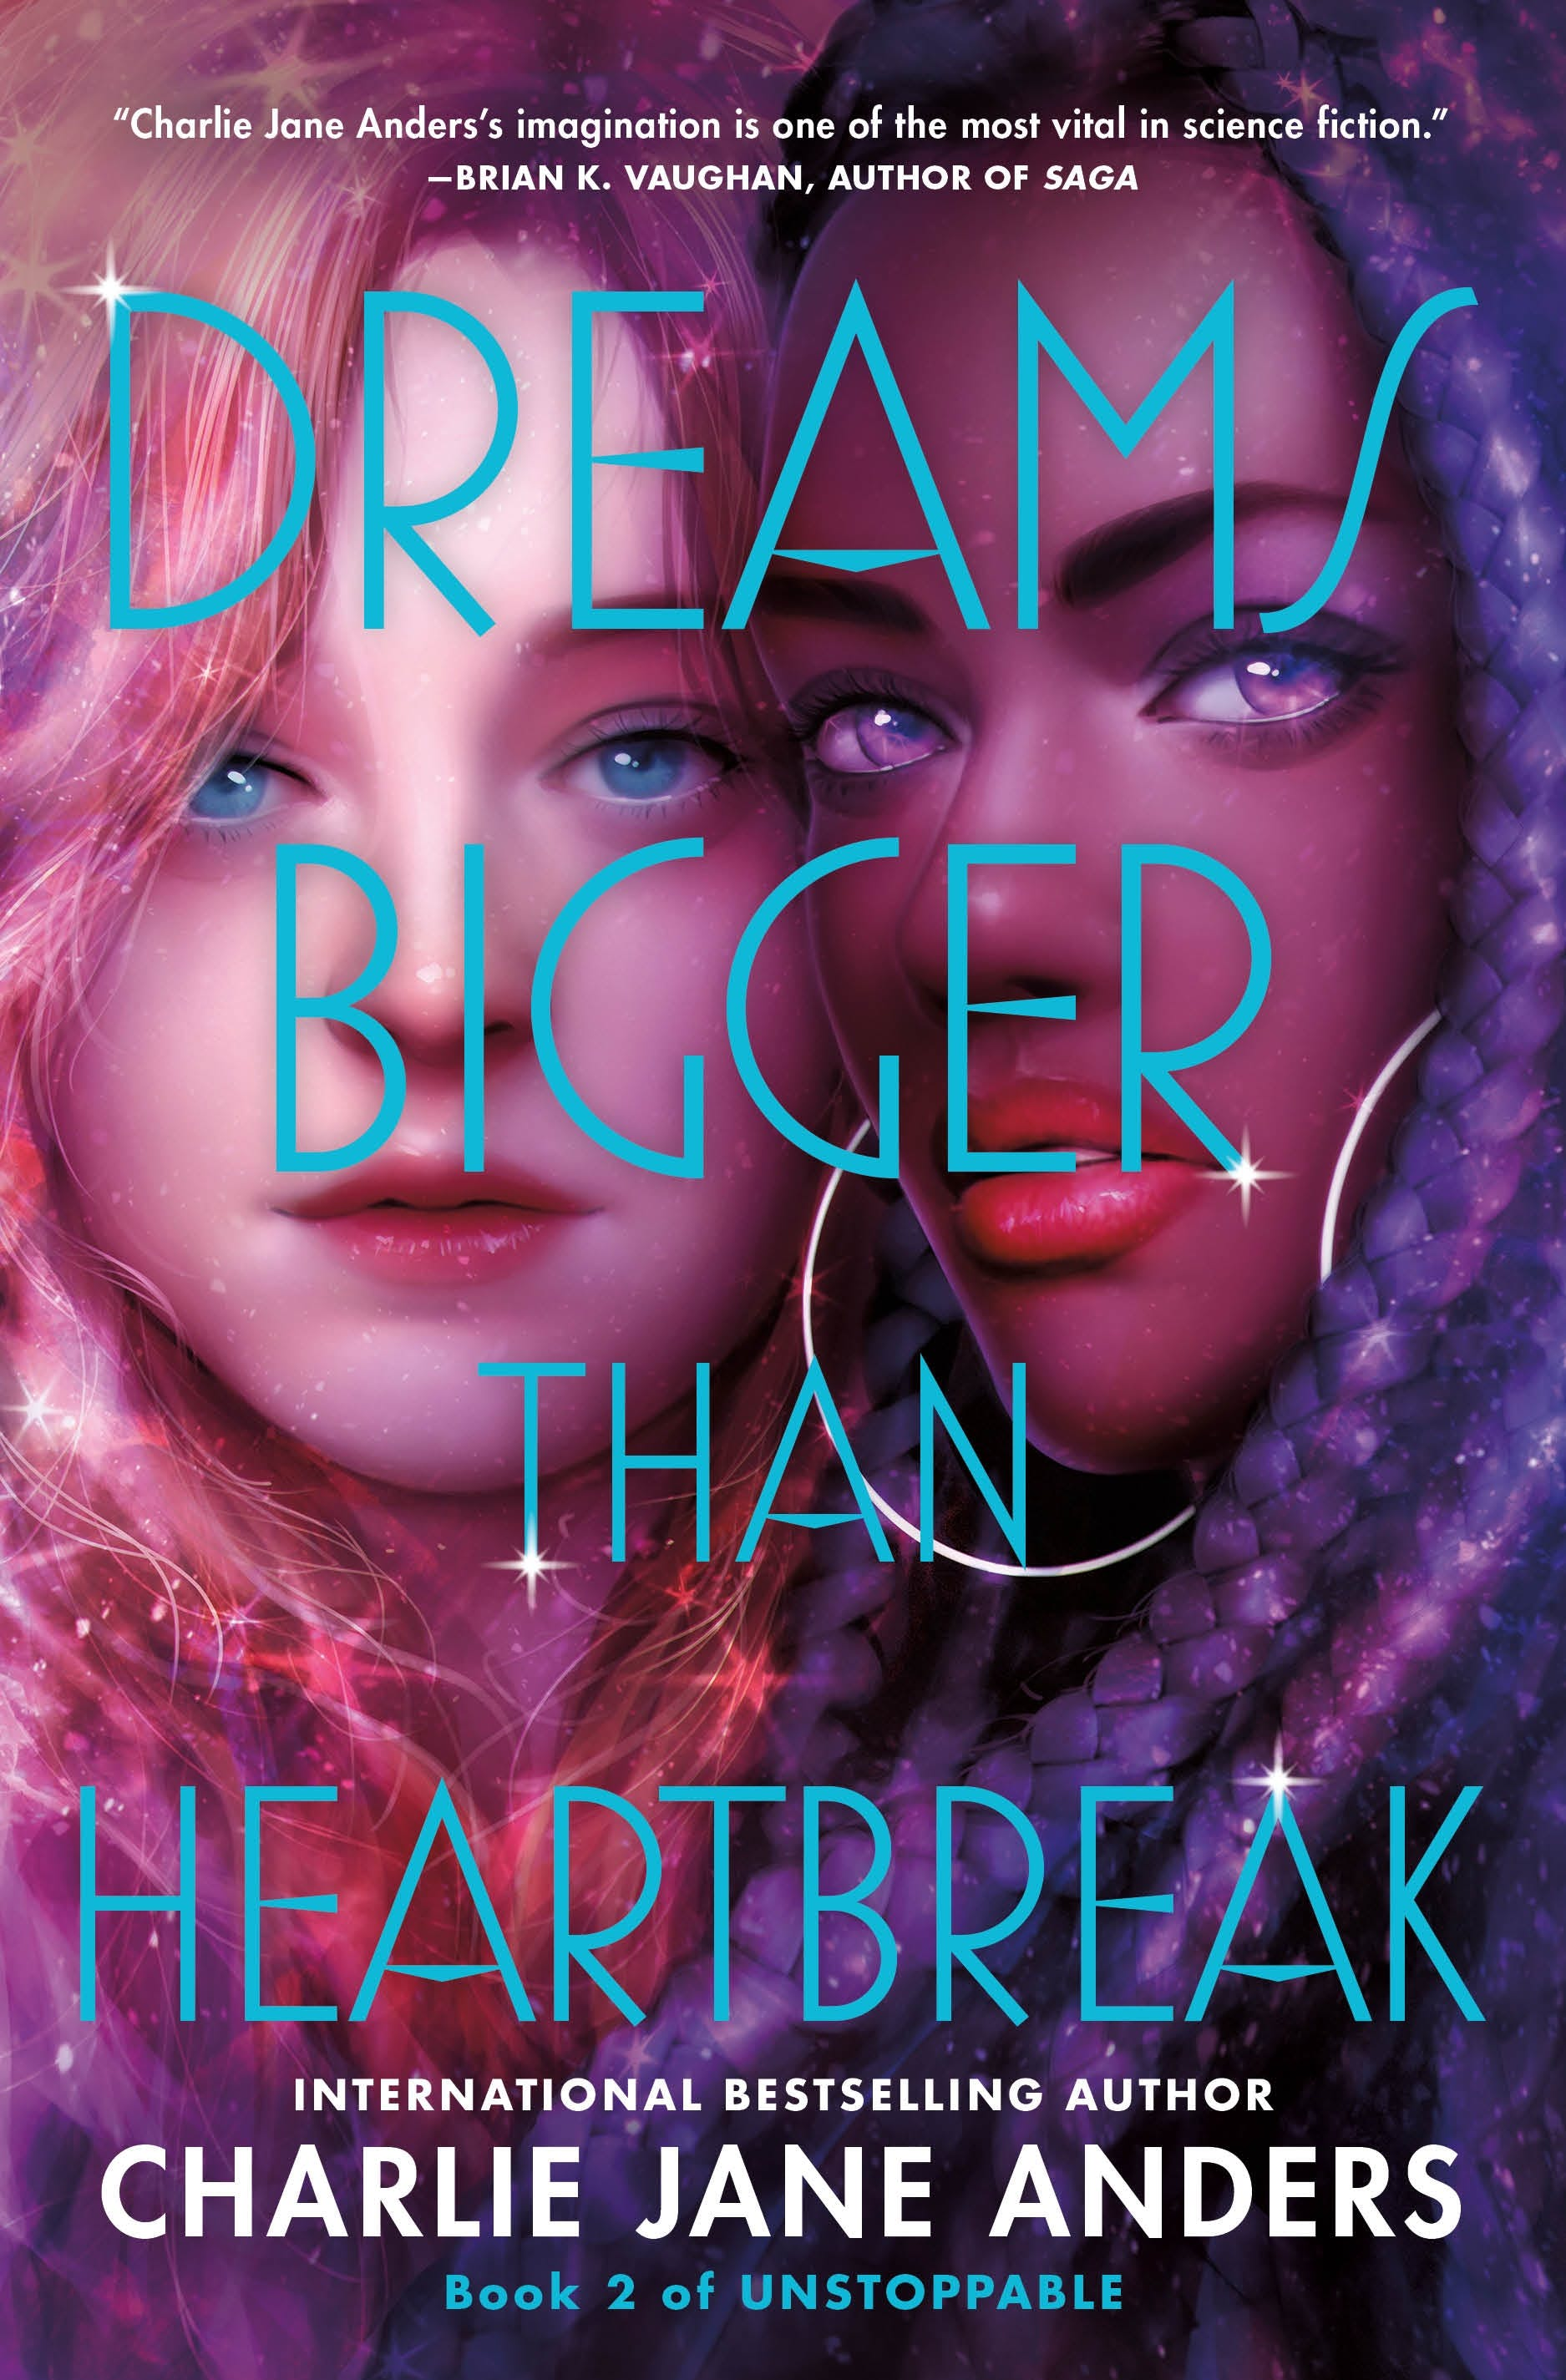 Image of Dreams Bigger Than Heartbreak